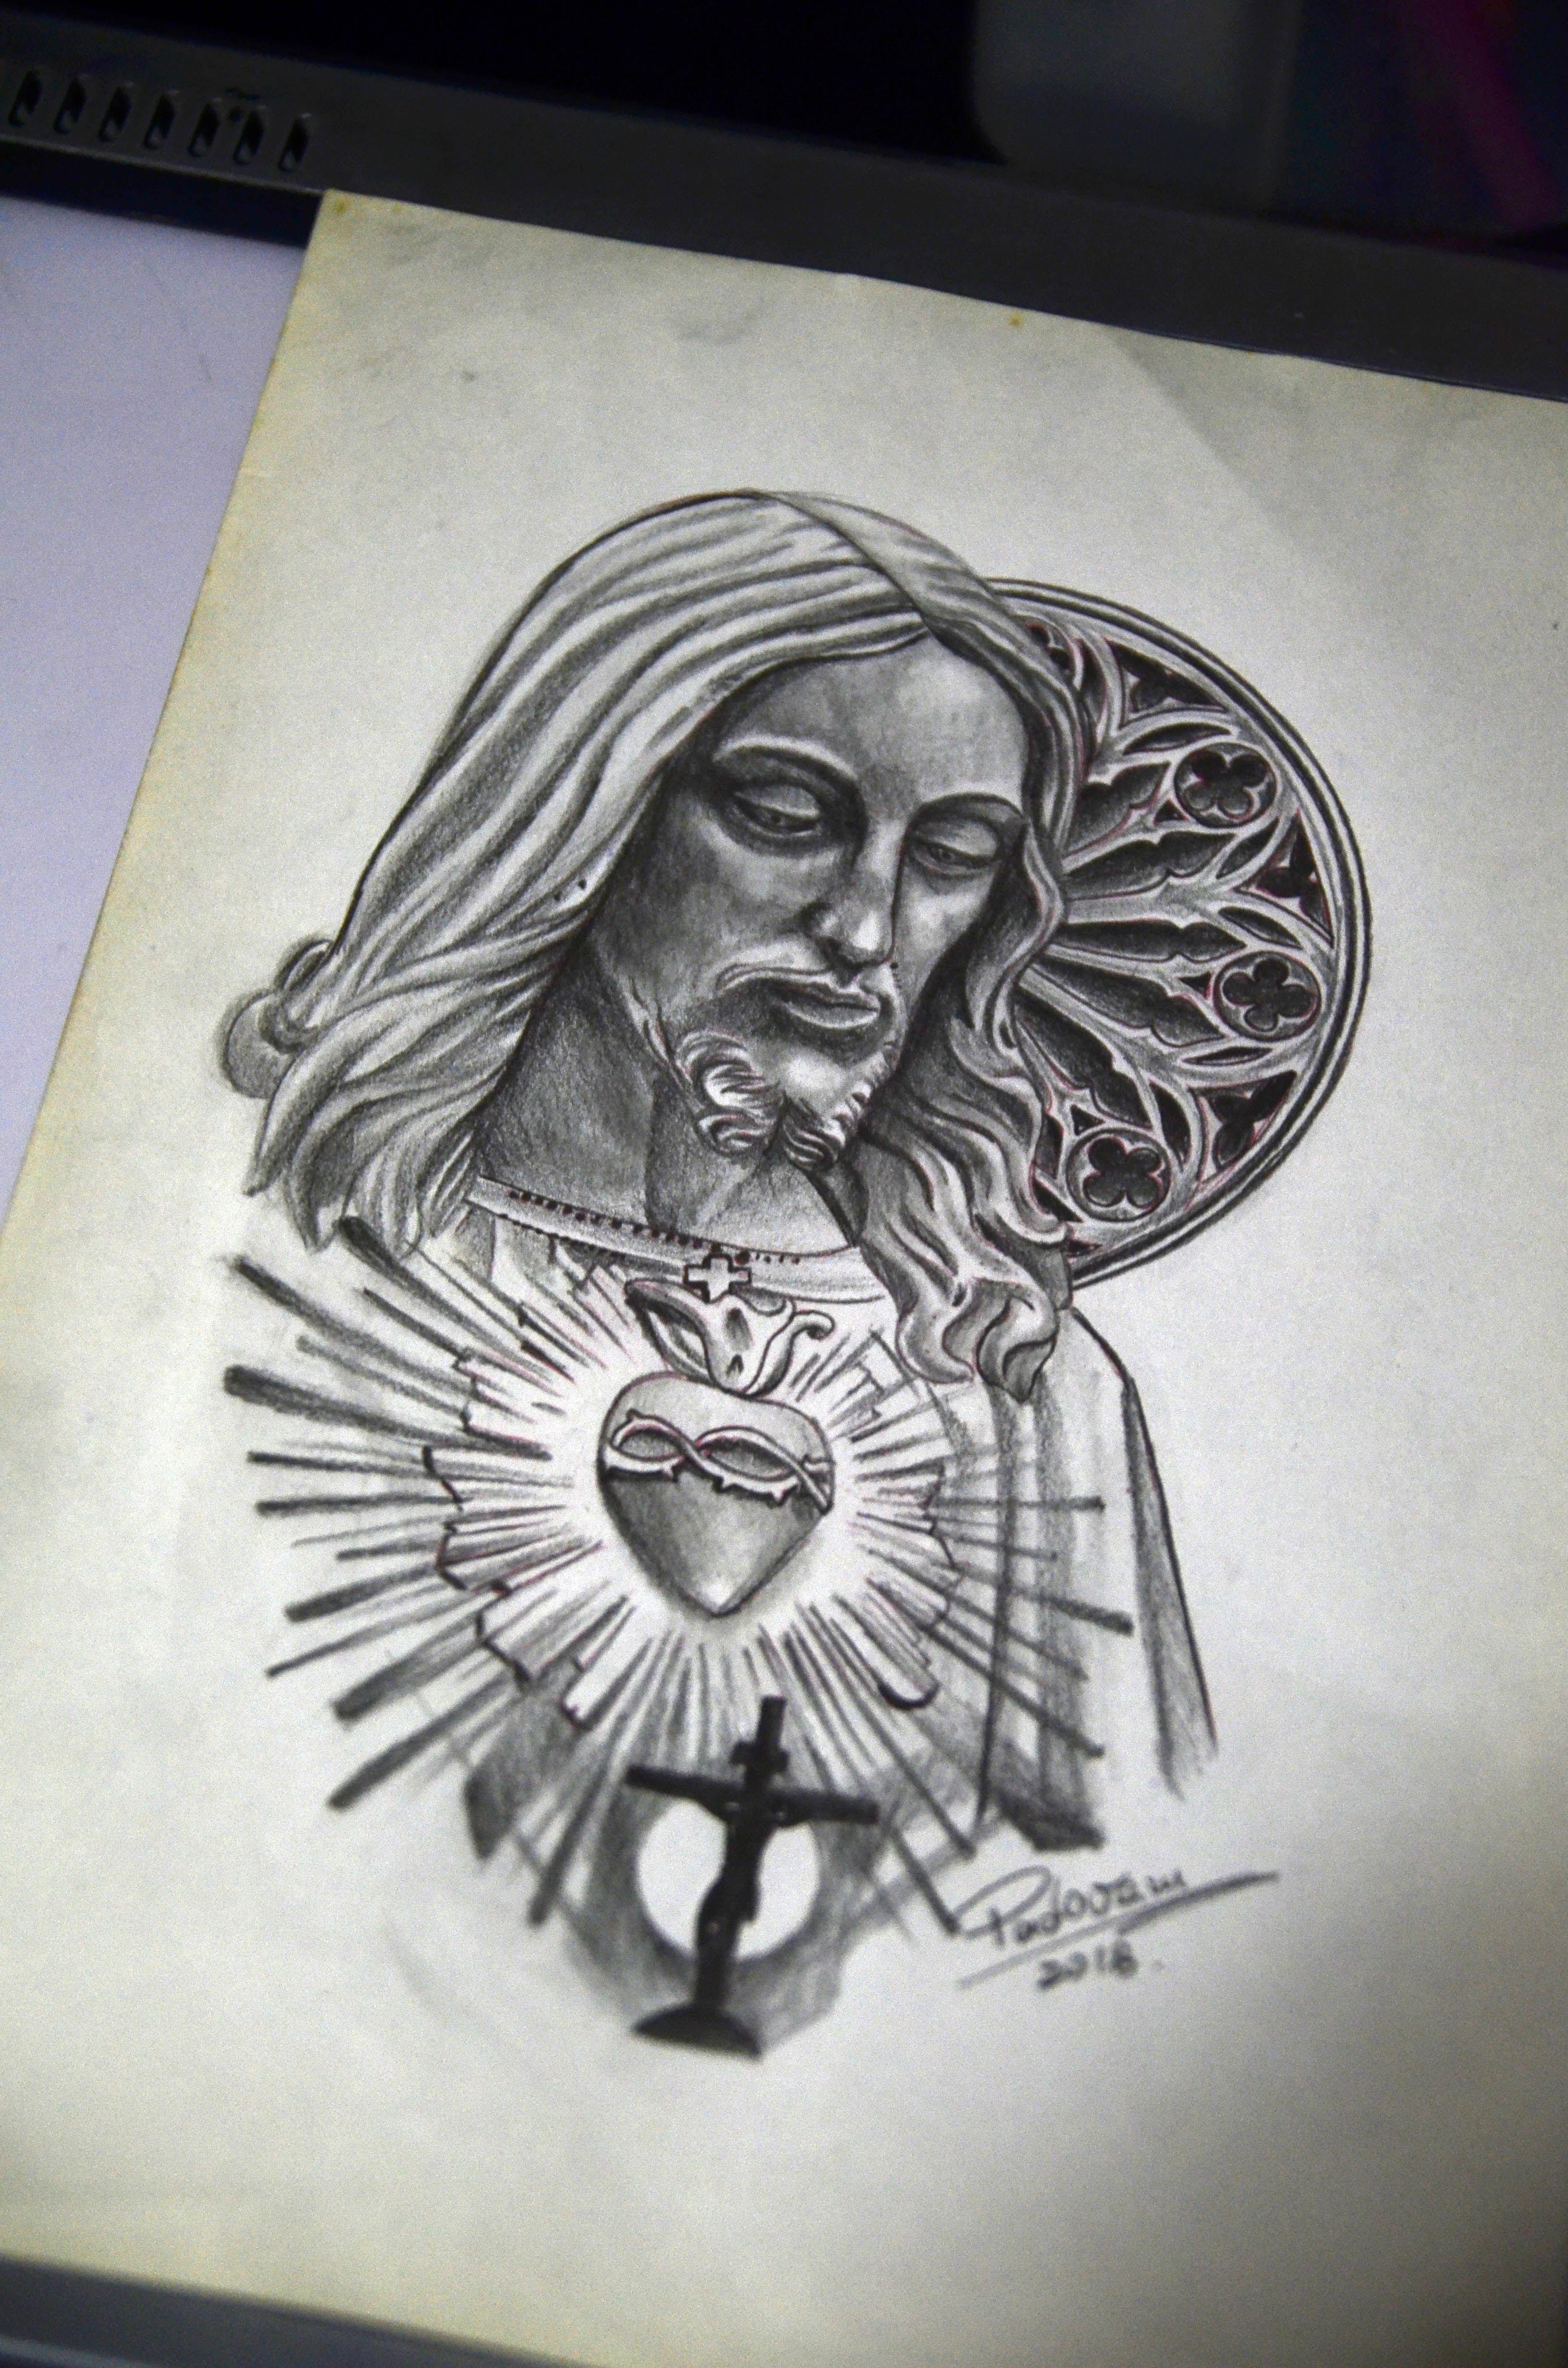 Jesus Tattoo Sketch Tatuagem Religiosa Tatuagem Desenho Jesus